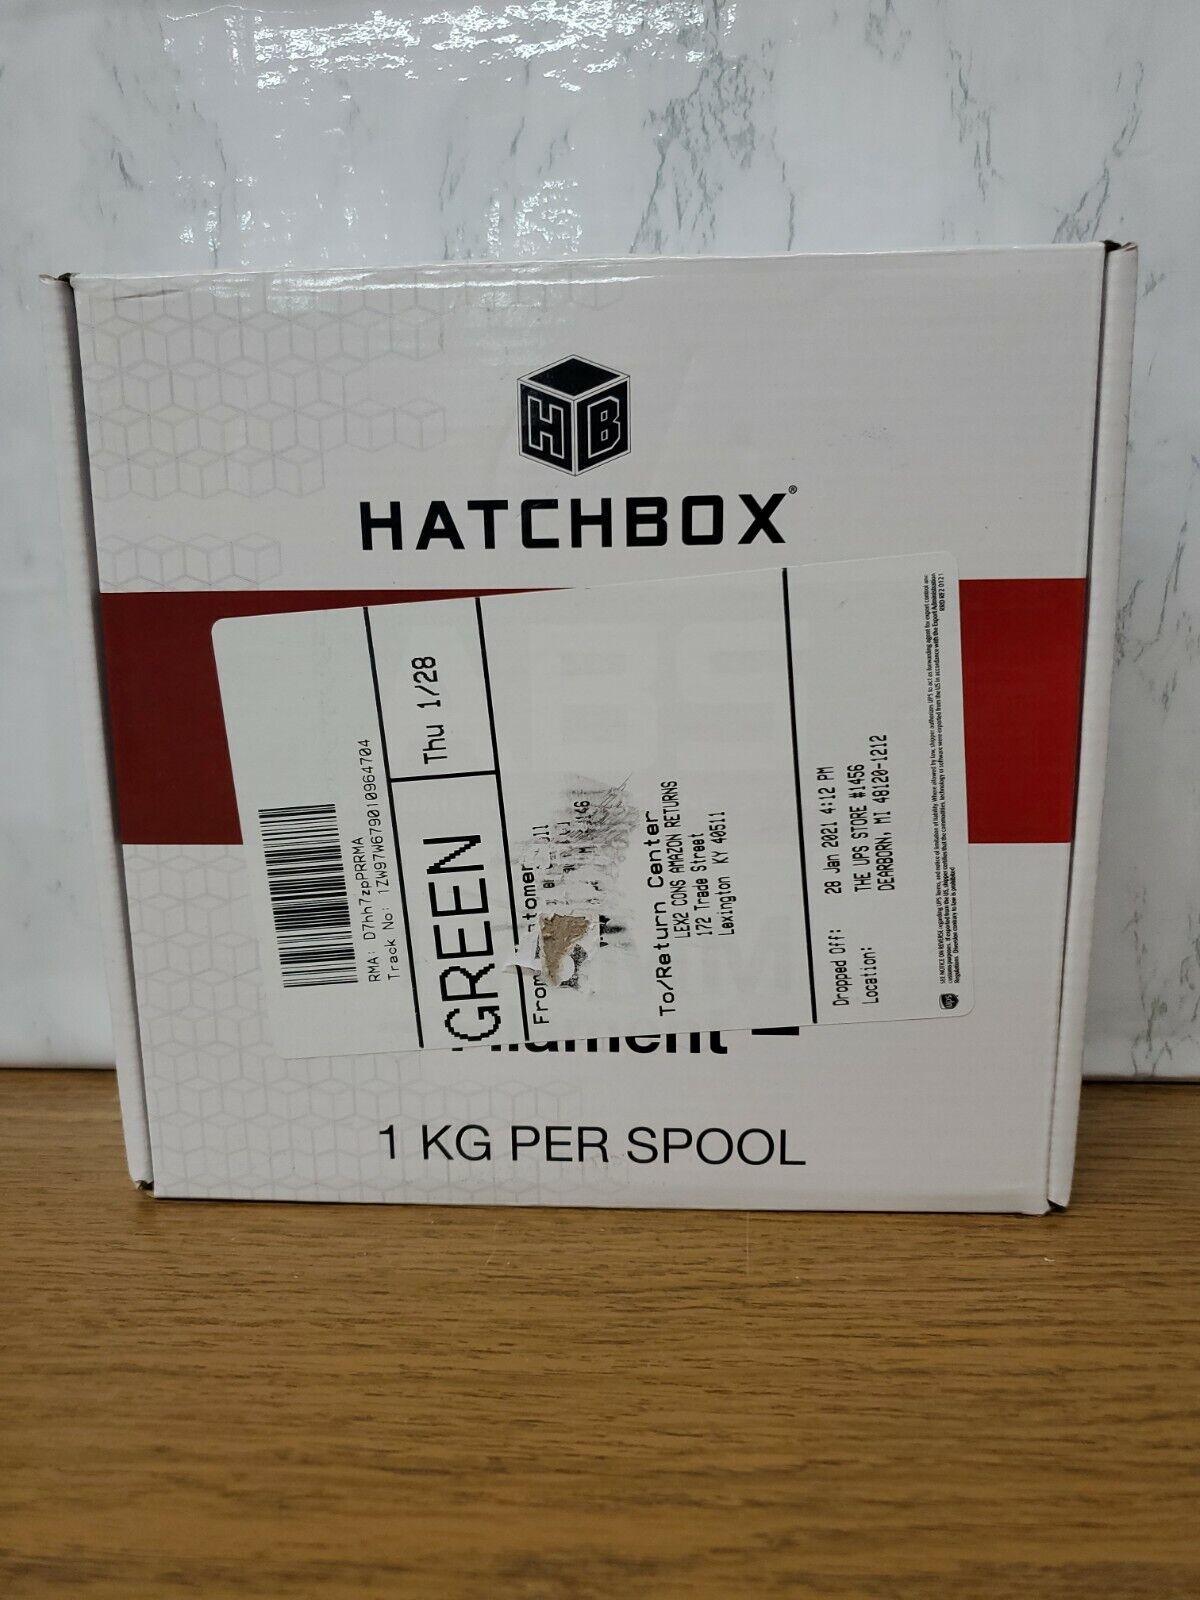 C4 HATCHBOX Abs 1.75 mm 3D Printer Filament in White, 1kg Spool